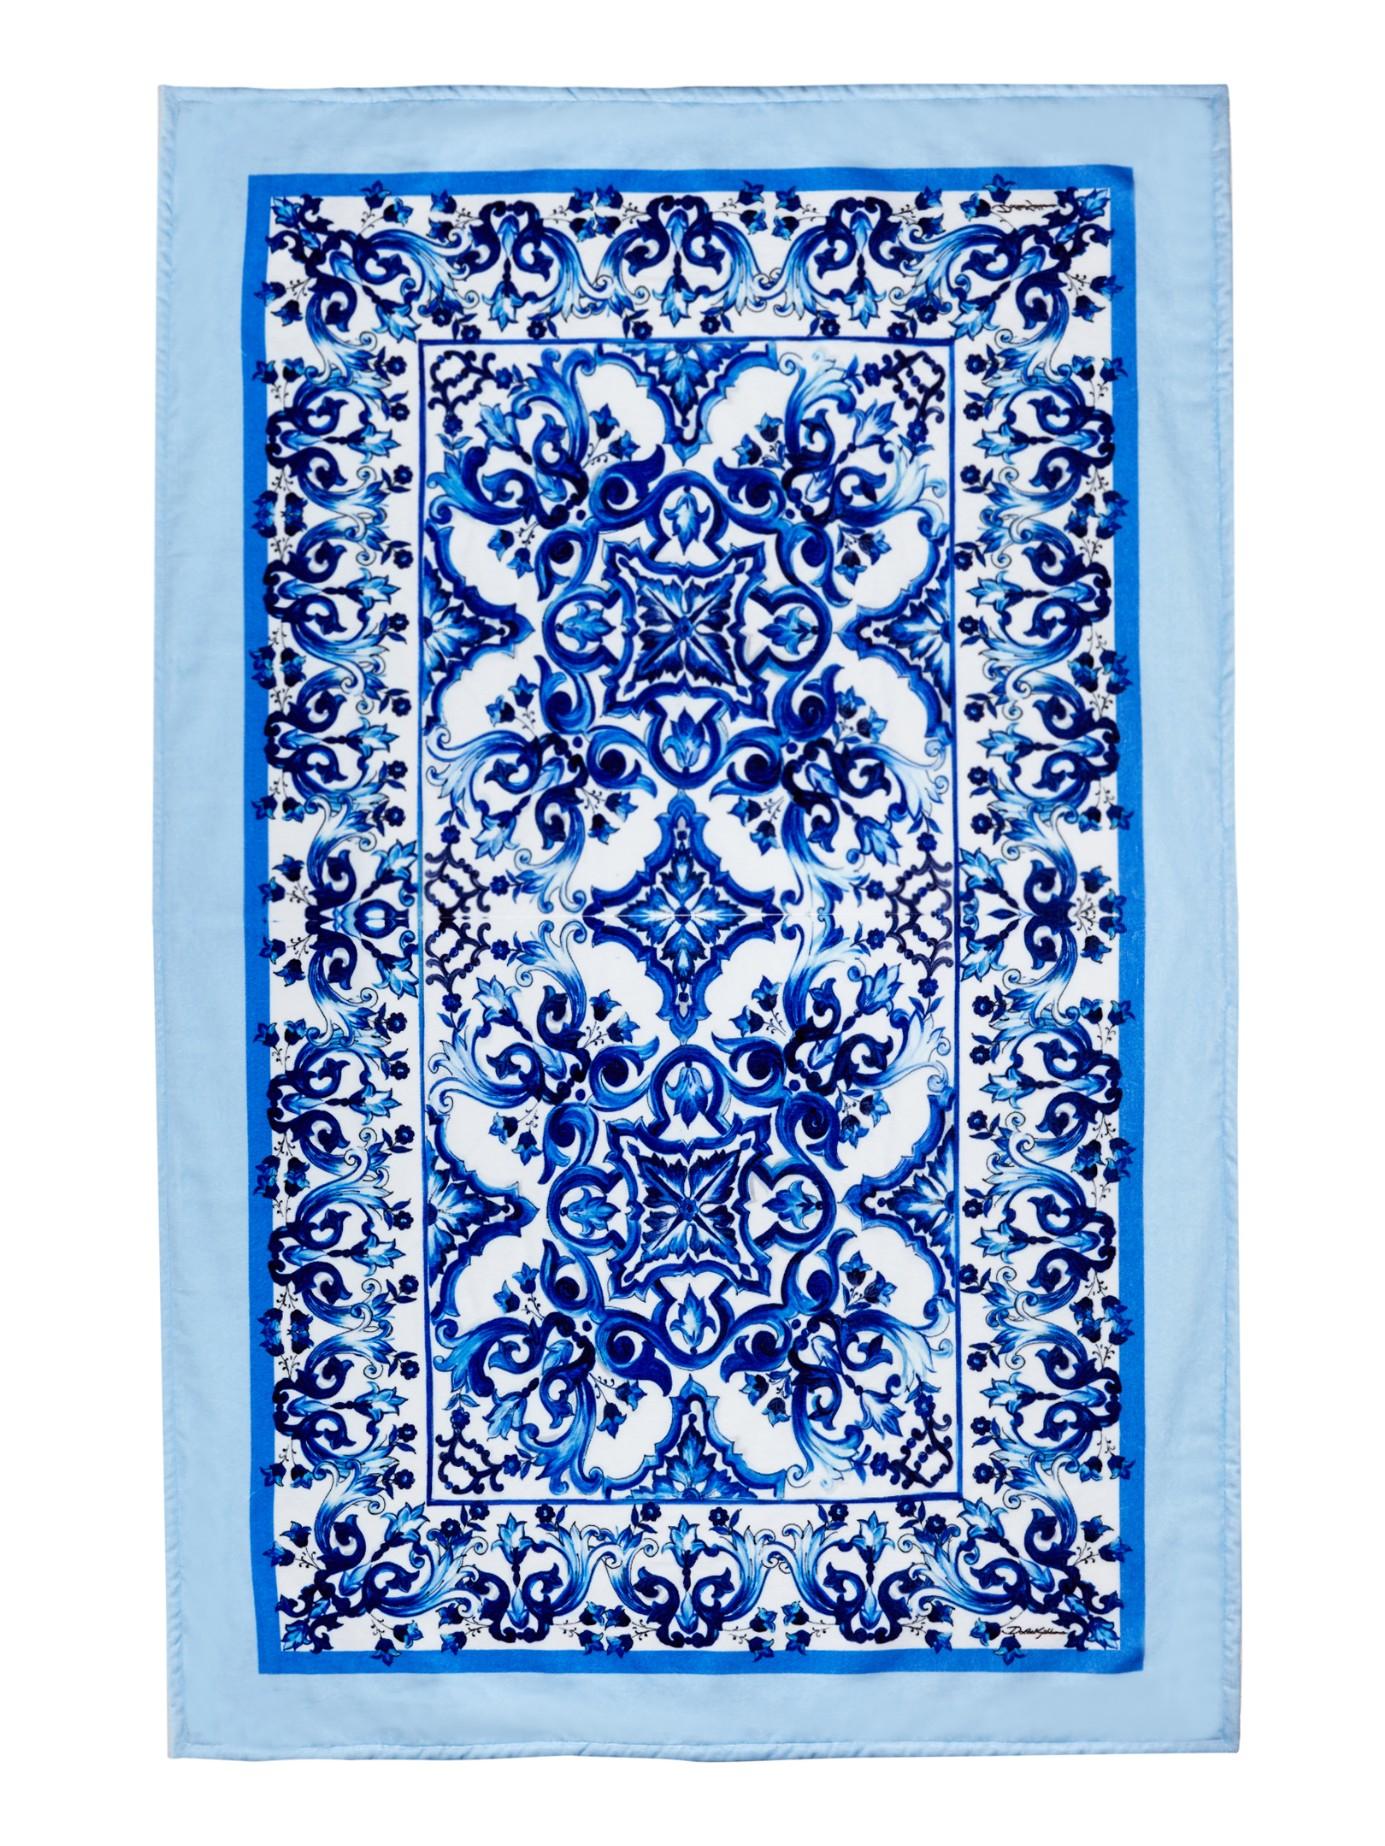 Lyst - Dolce & Gabbana Majolica-Print Towel in Blue